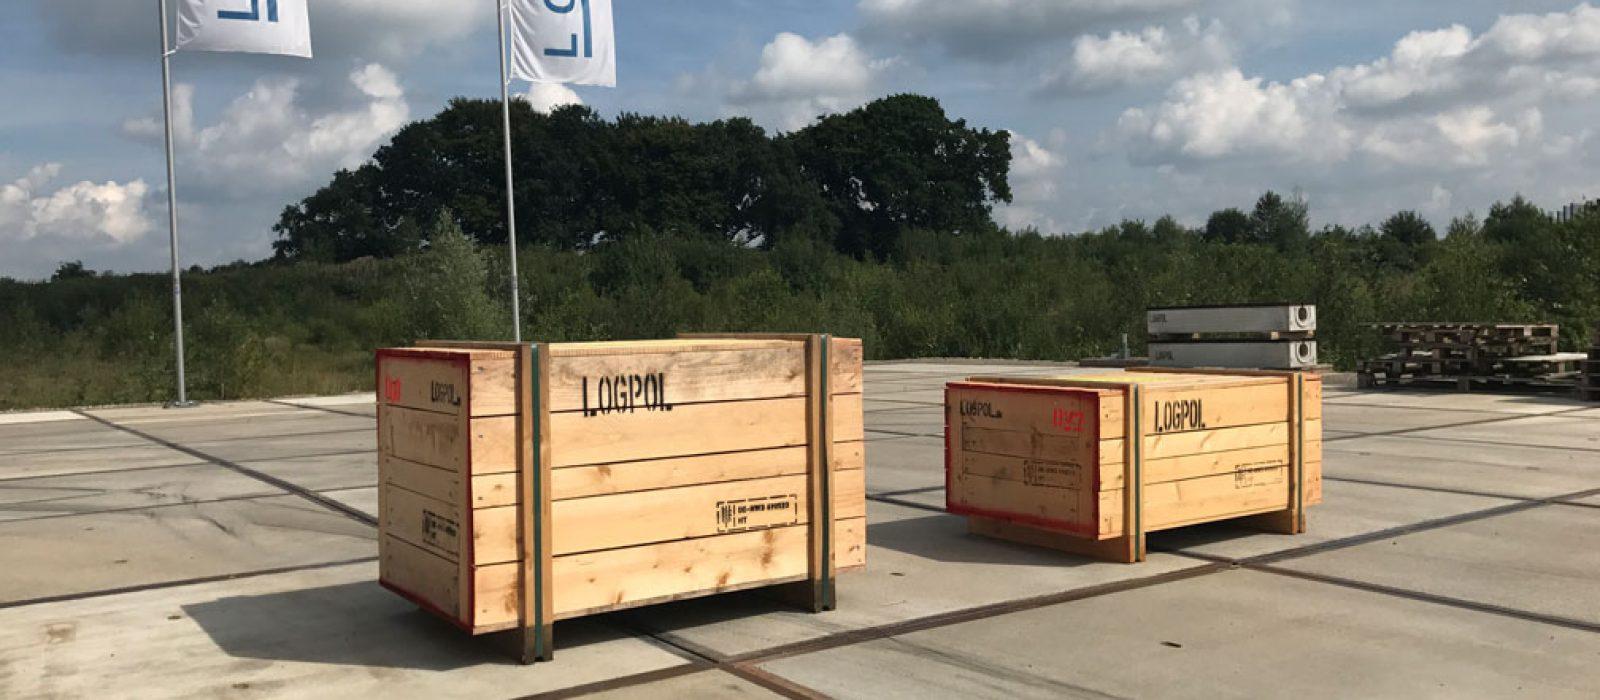 LOGPOL-Kiste-1200x800x800-mm